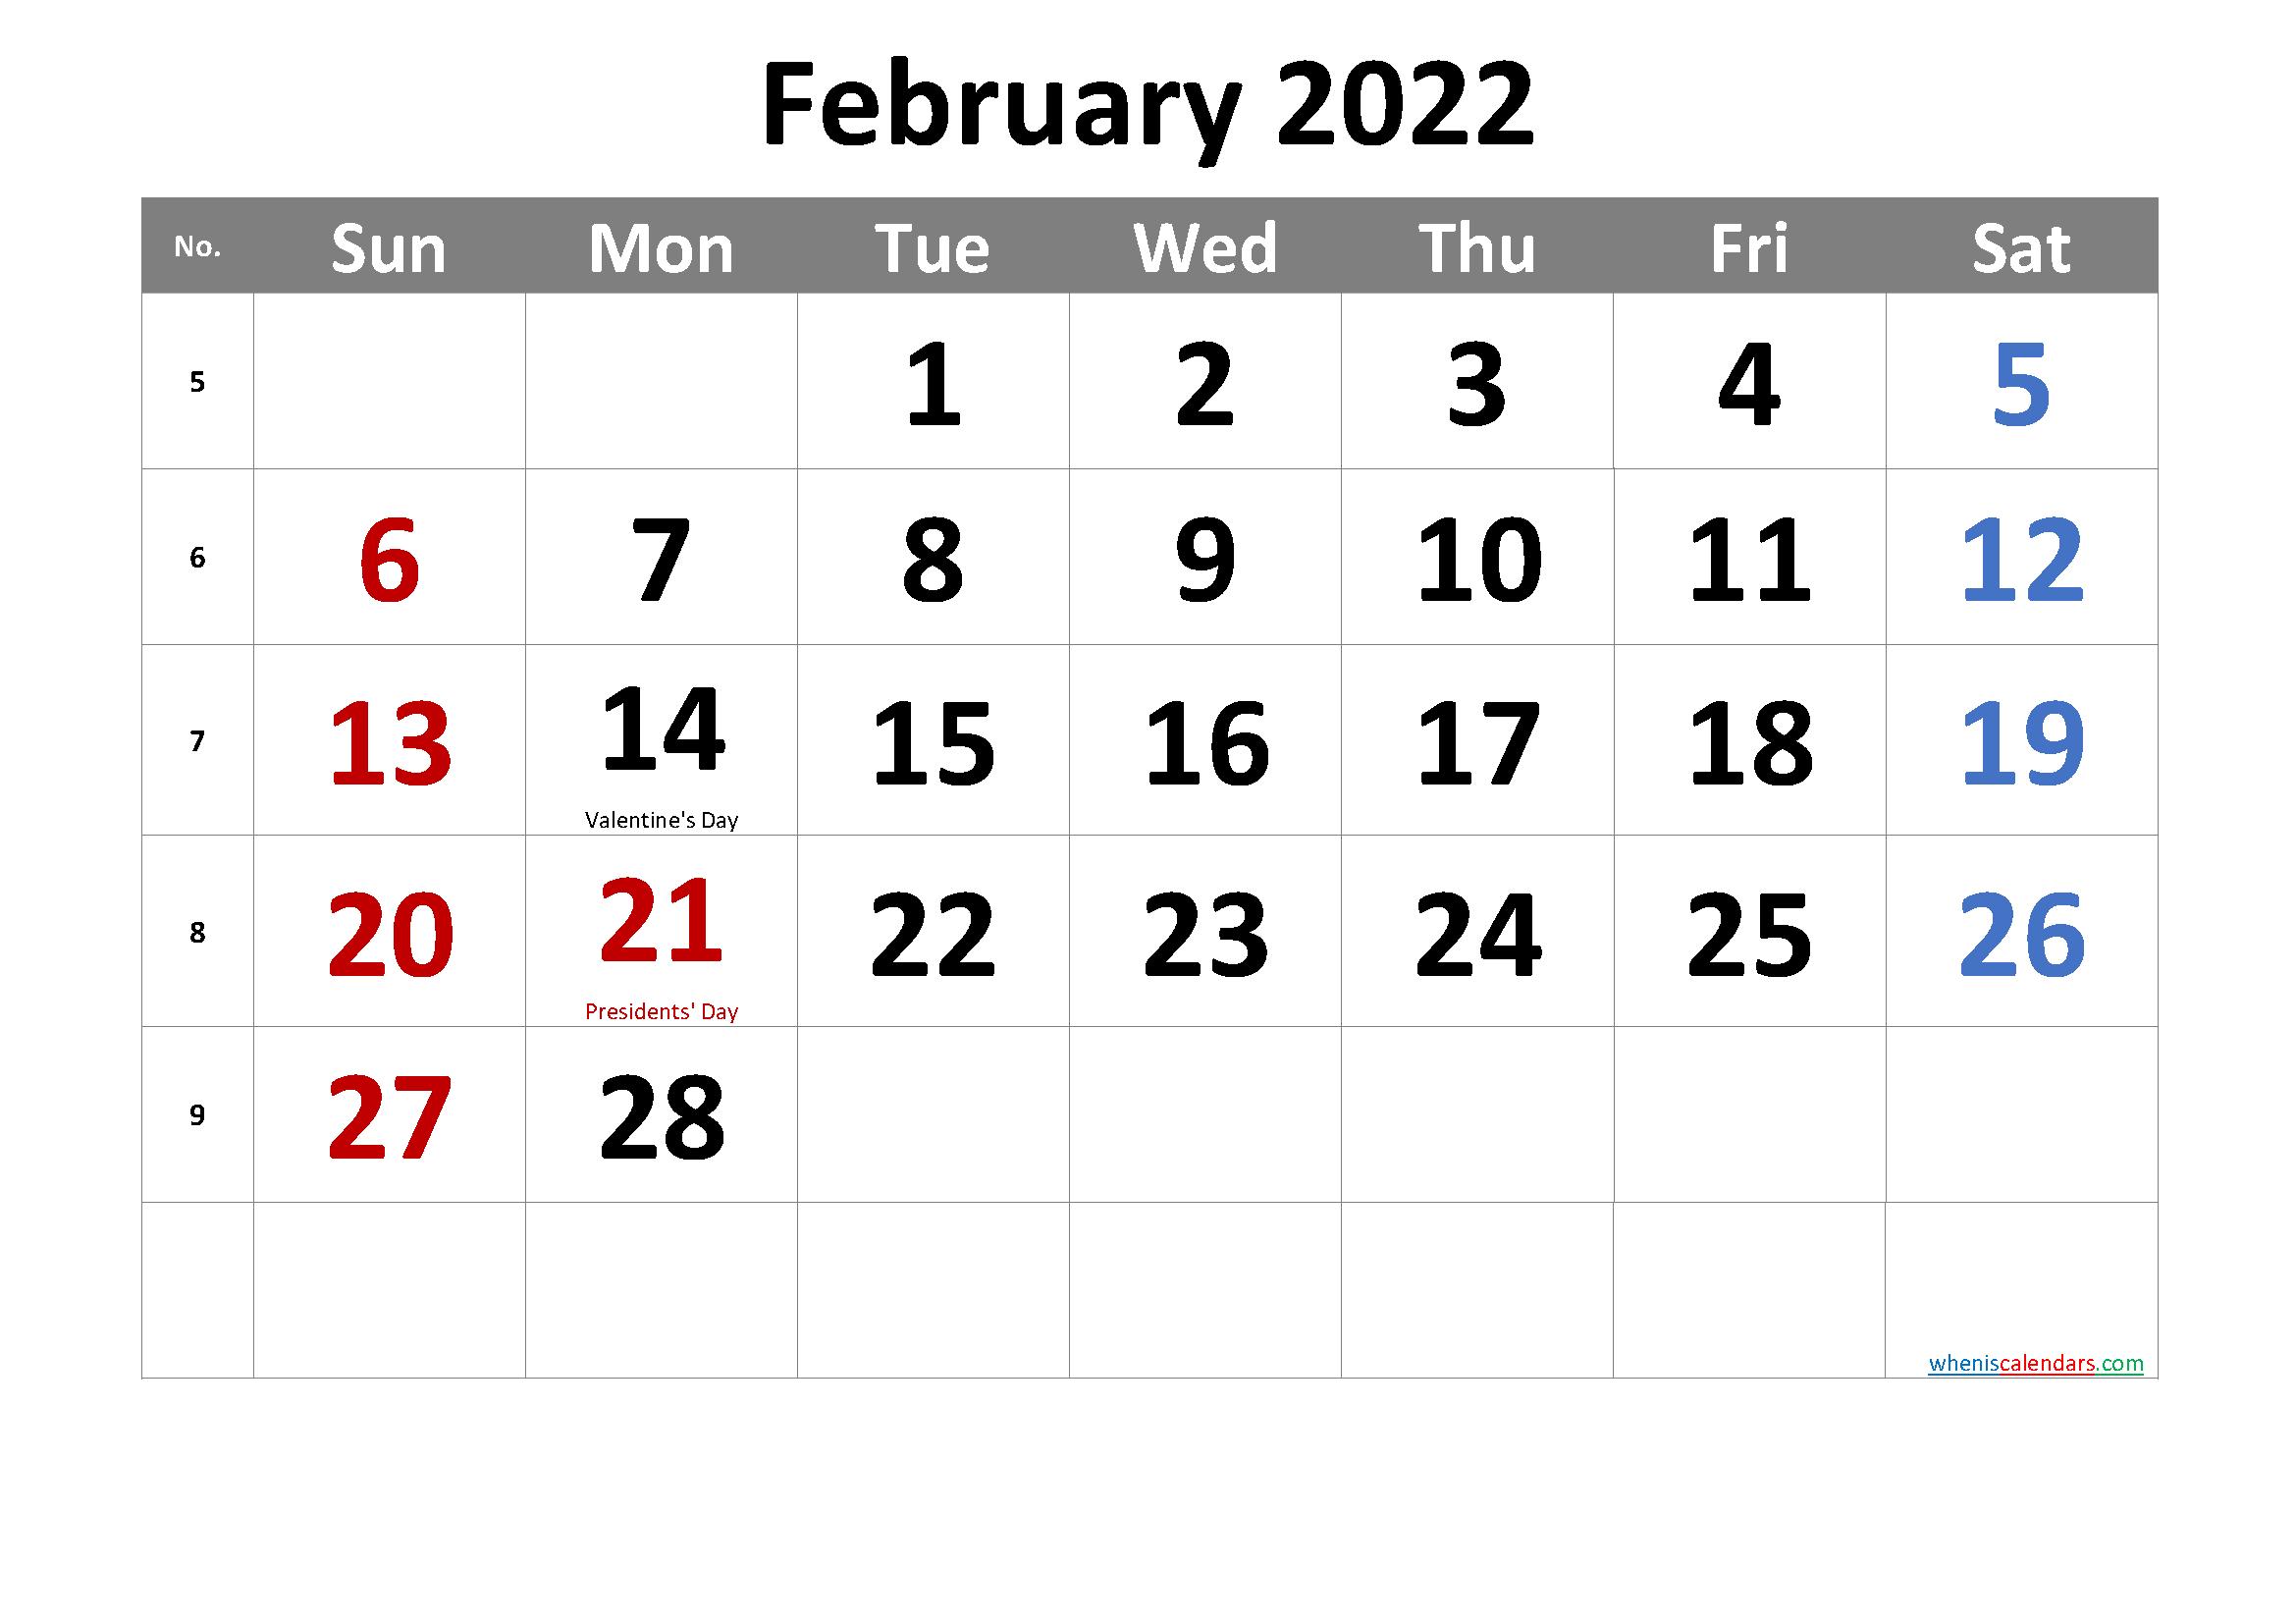 Free Printable February 2022 Calendar Regarding Printable February 2022 Calendar